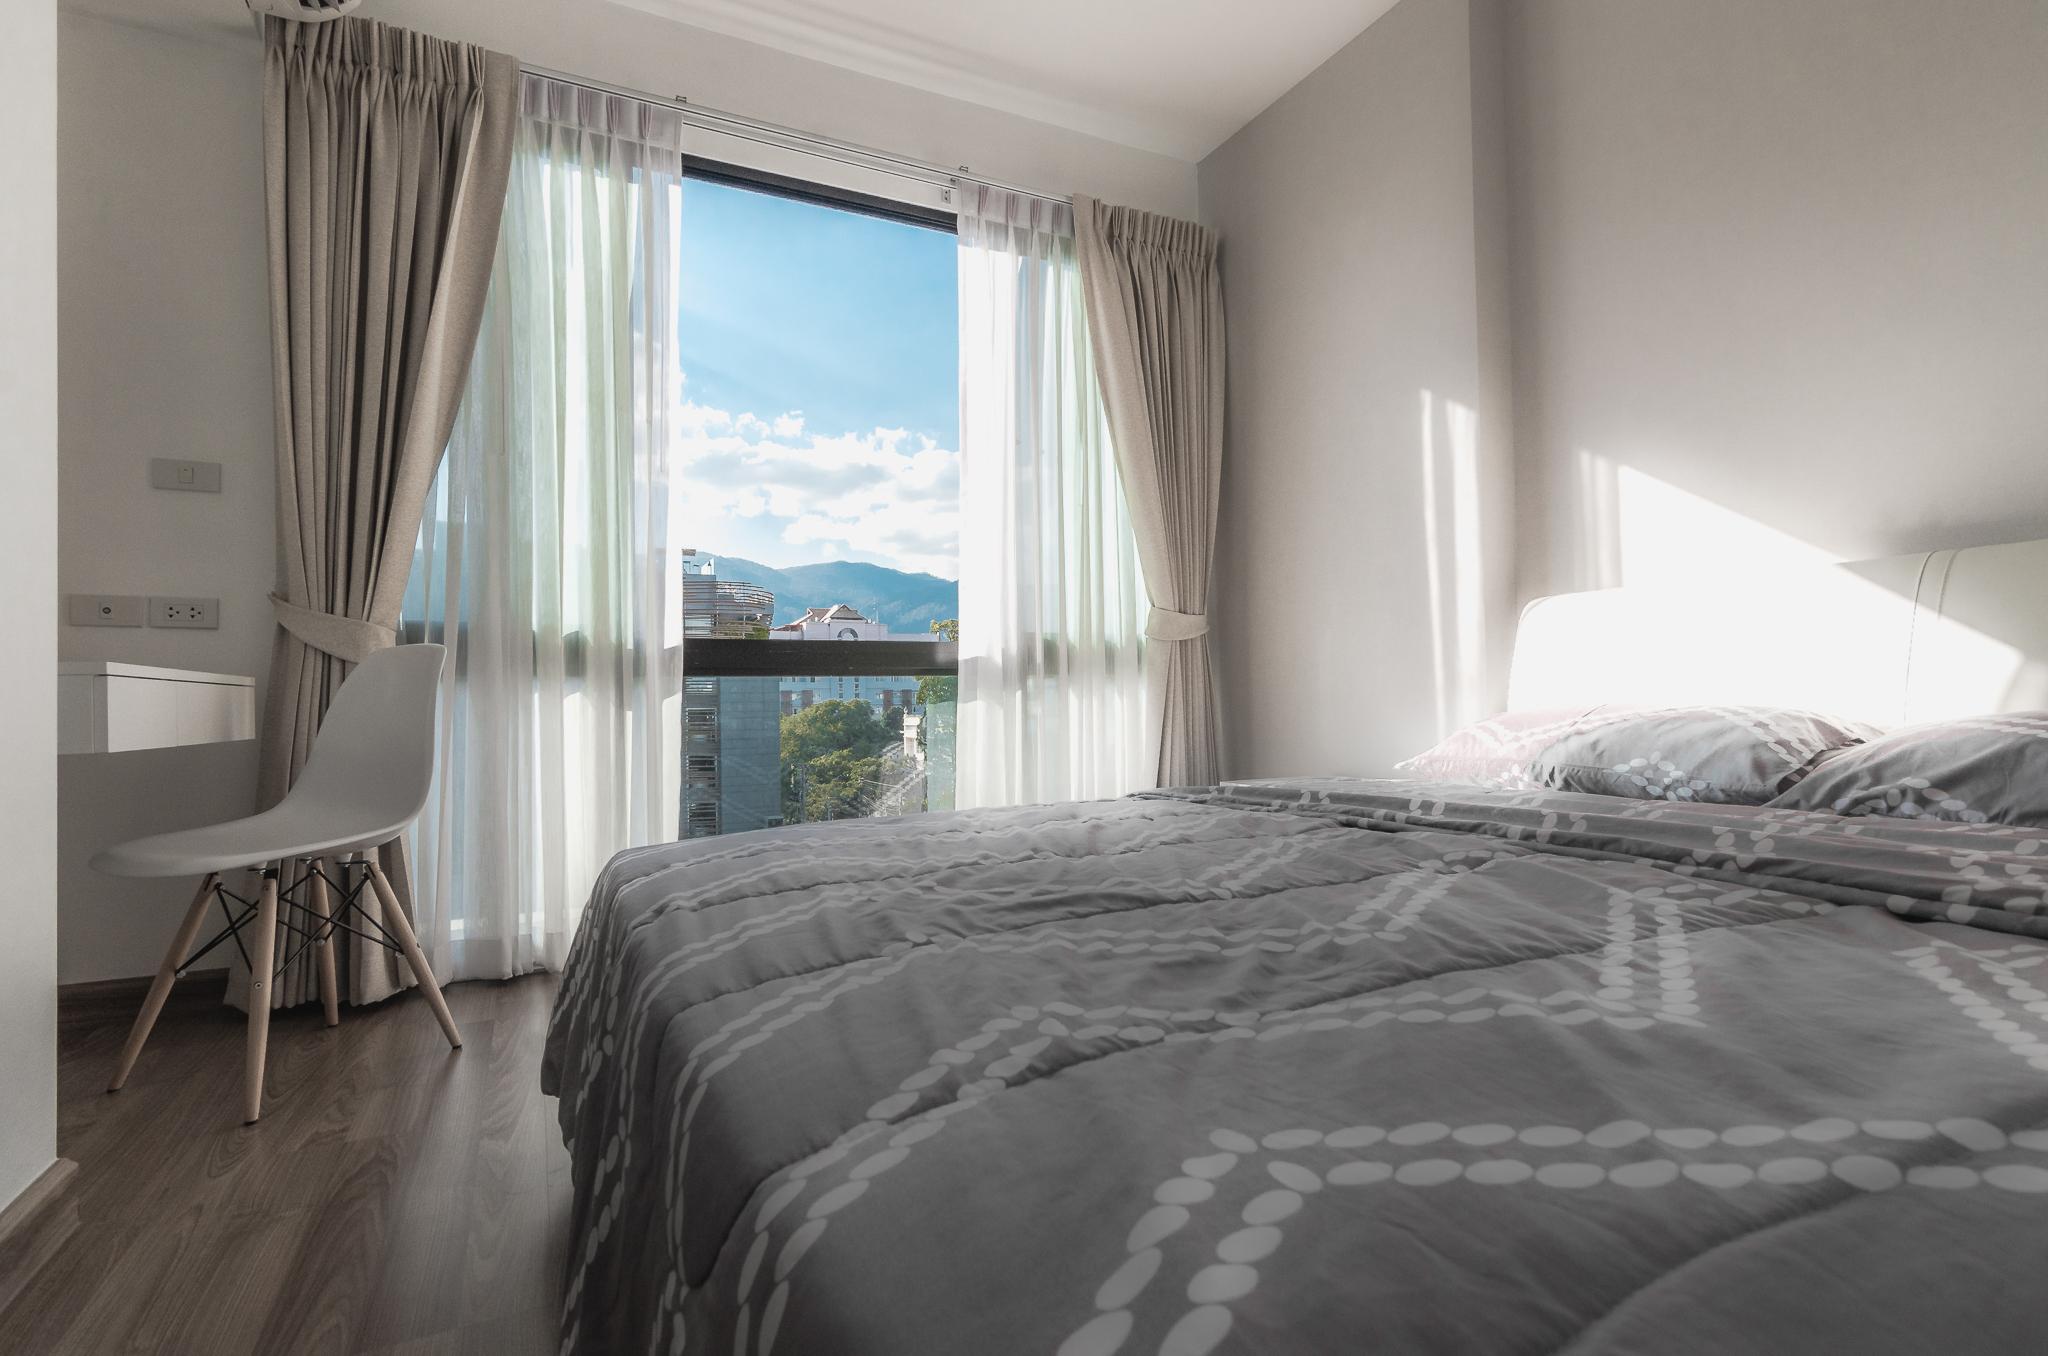 the-nimman-condo-chiang-mai-thailand-bedroom-view.jpg